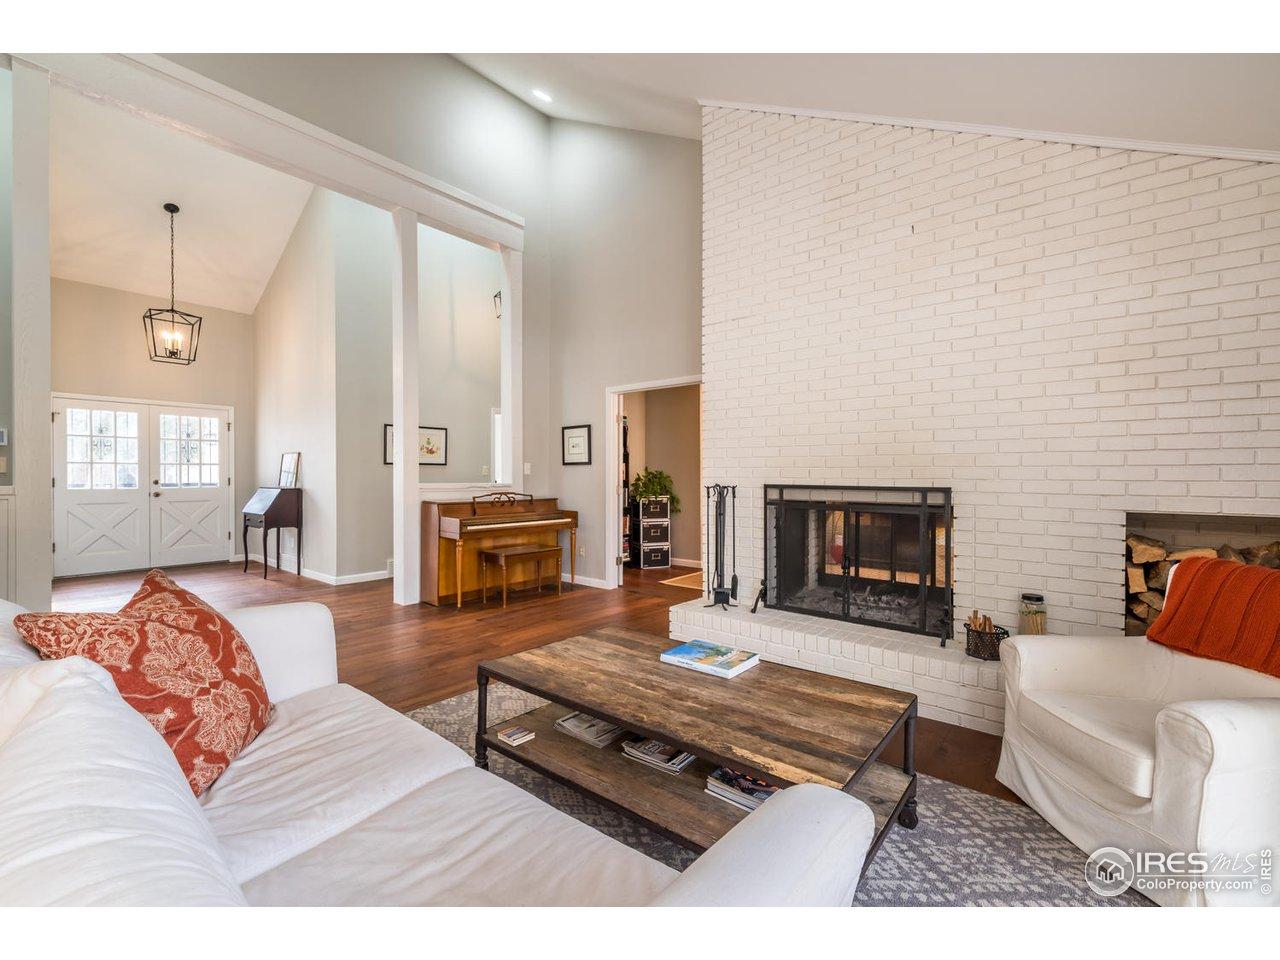 2-Sided Brick Fireplace